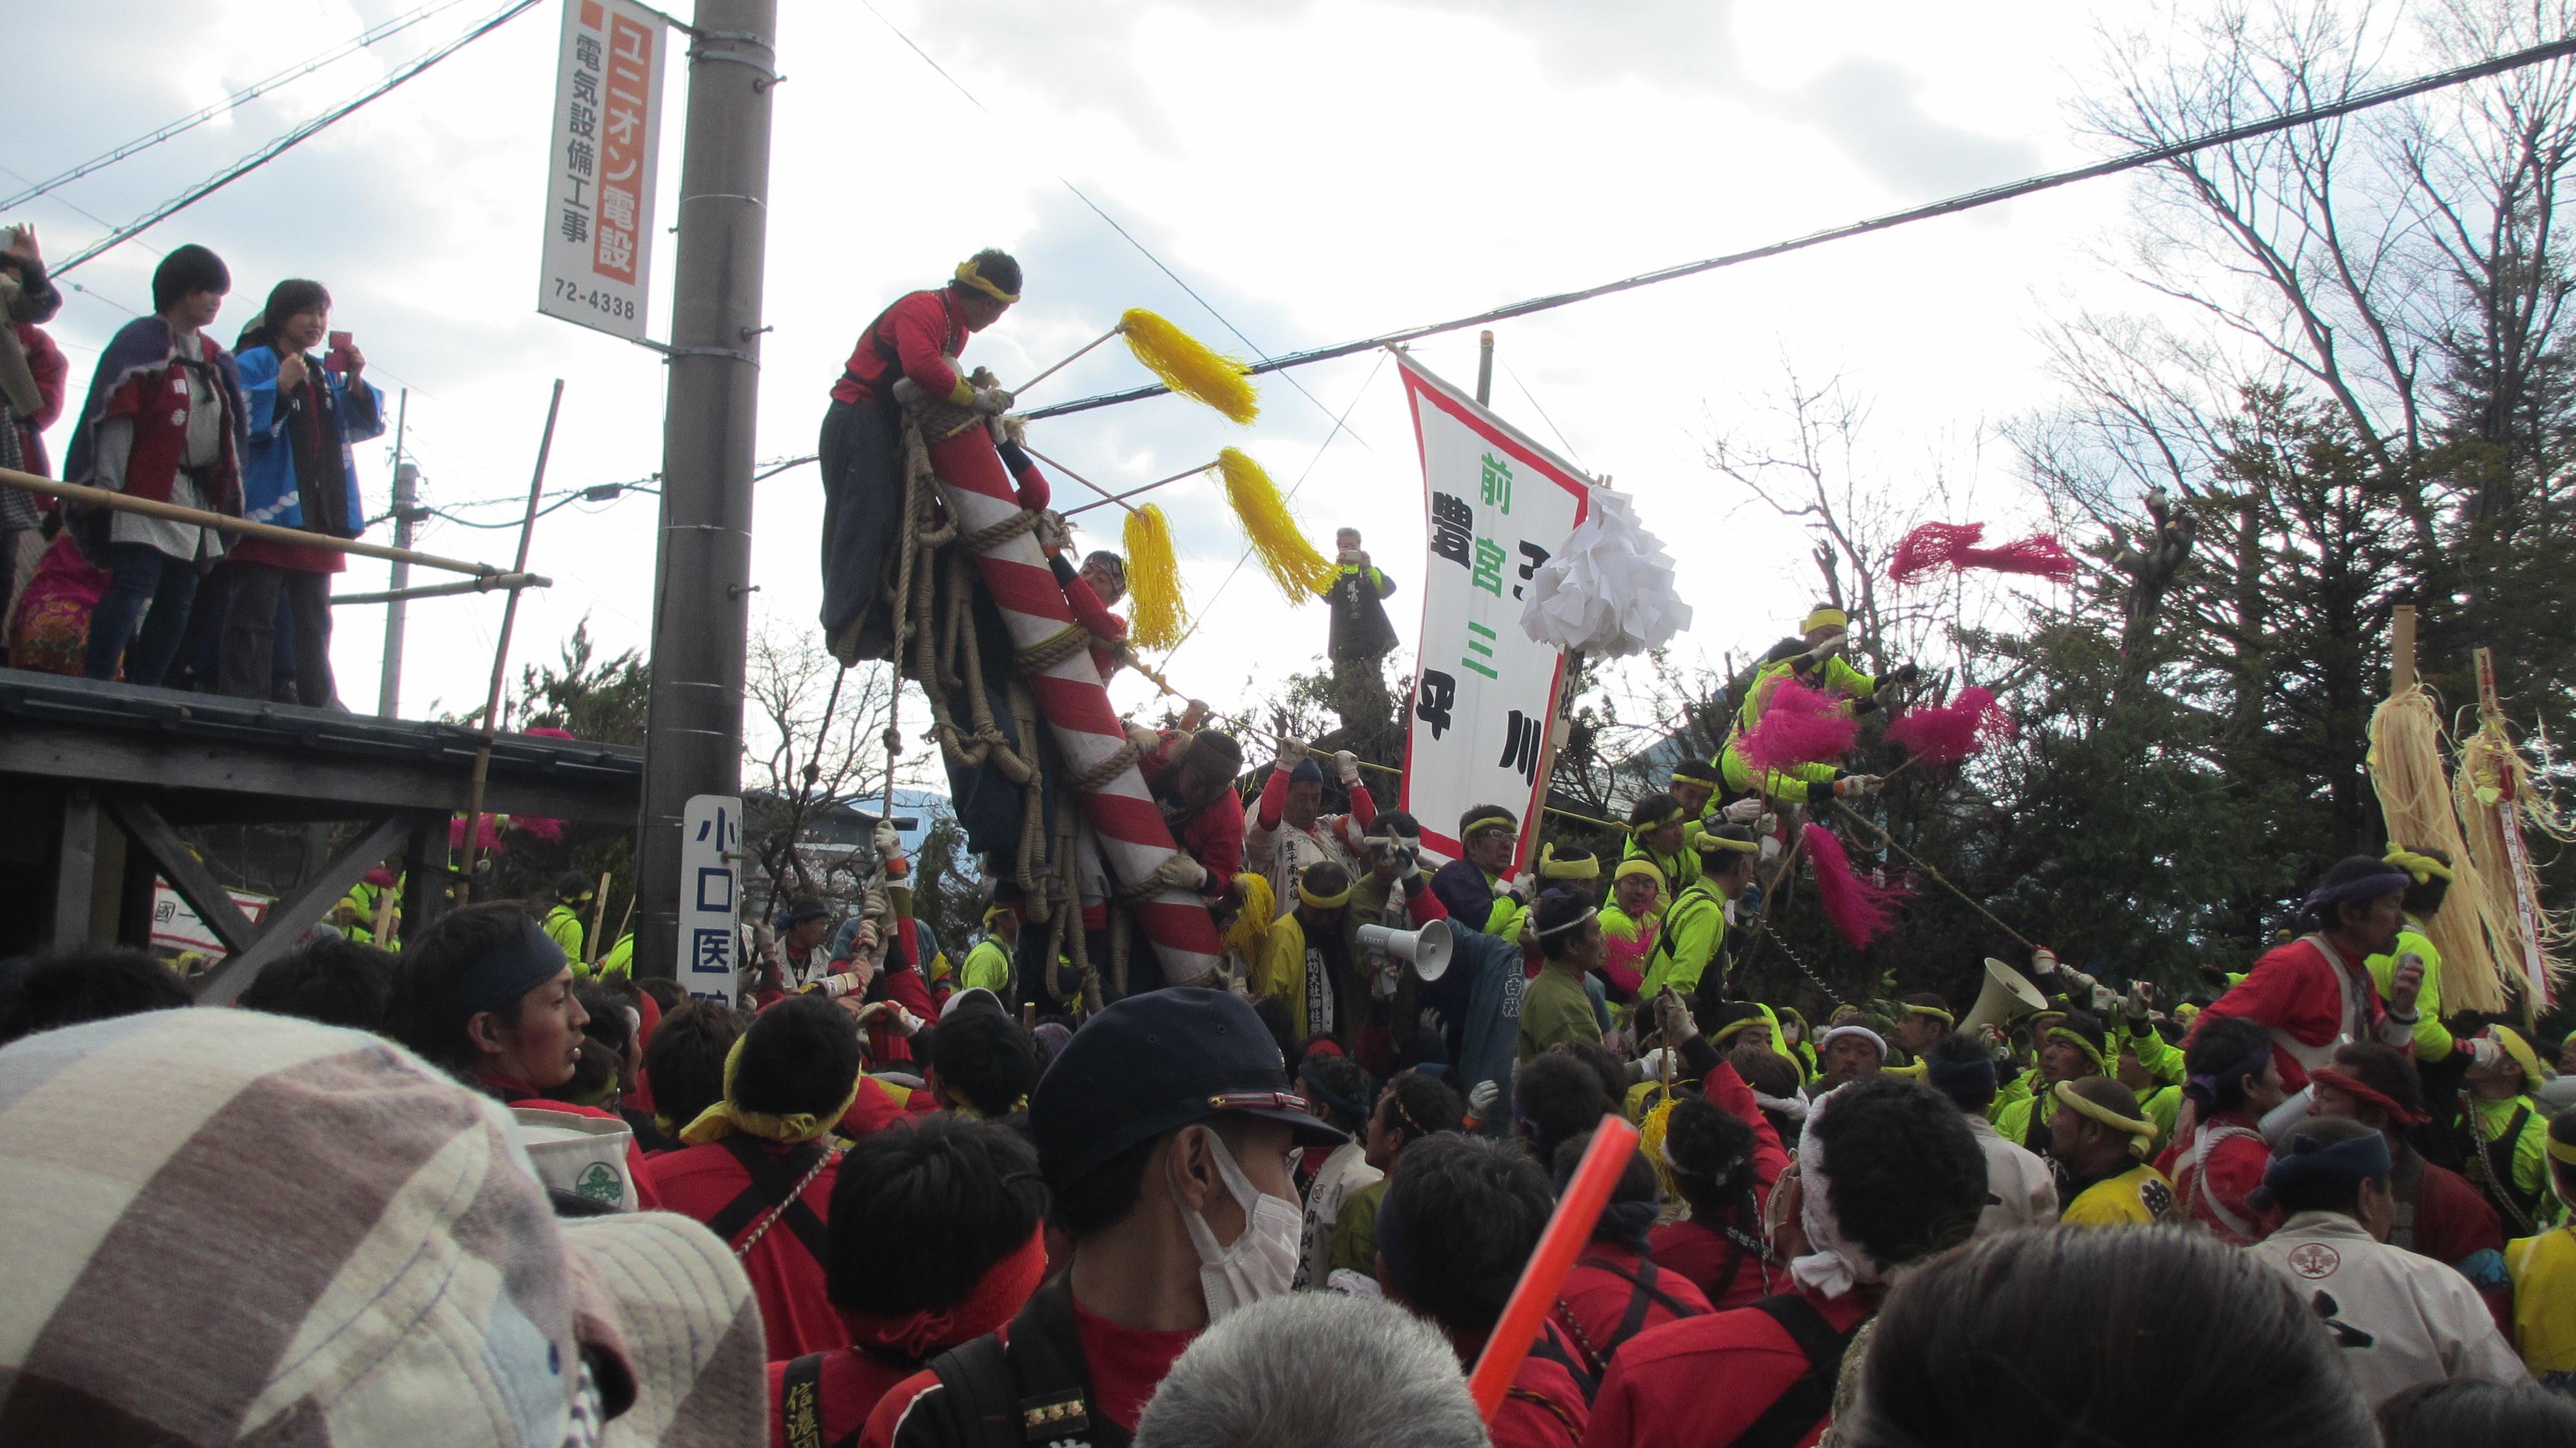 http://www.alpico.co.jp/shikinomori/news/images/IMG_5759.JPG